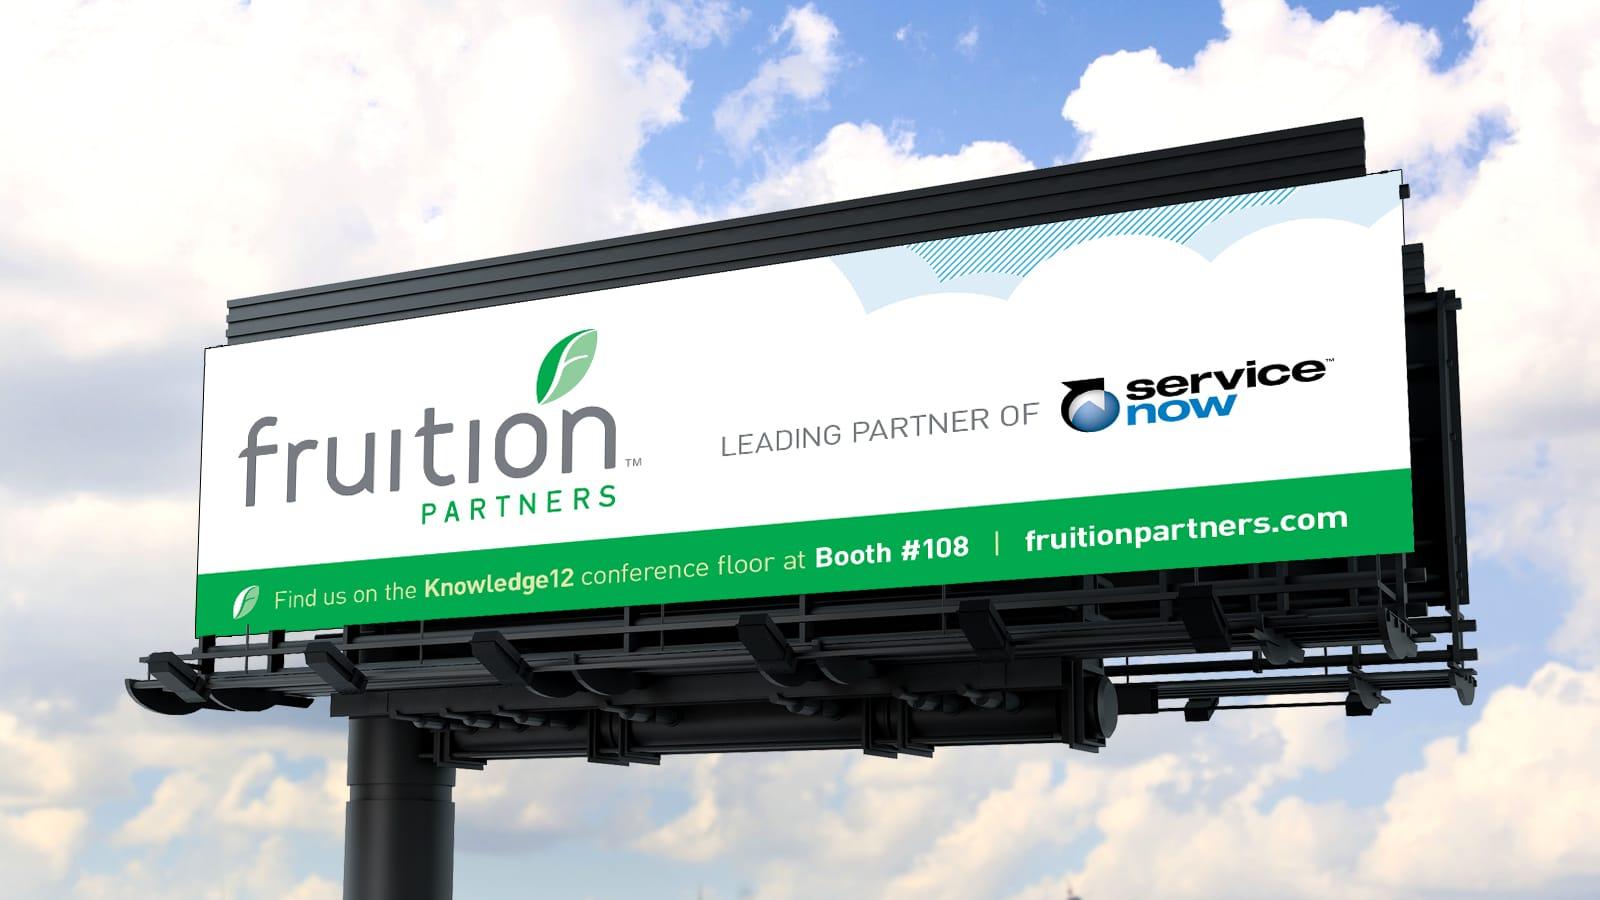 Fruition Partners billboard mockup against bright sky